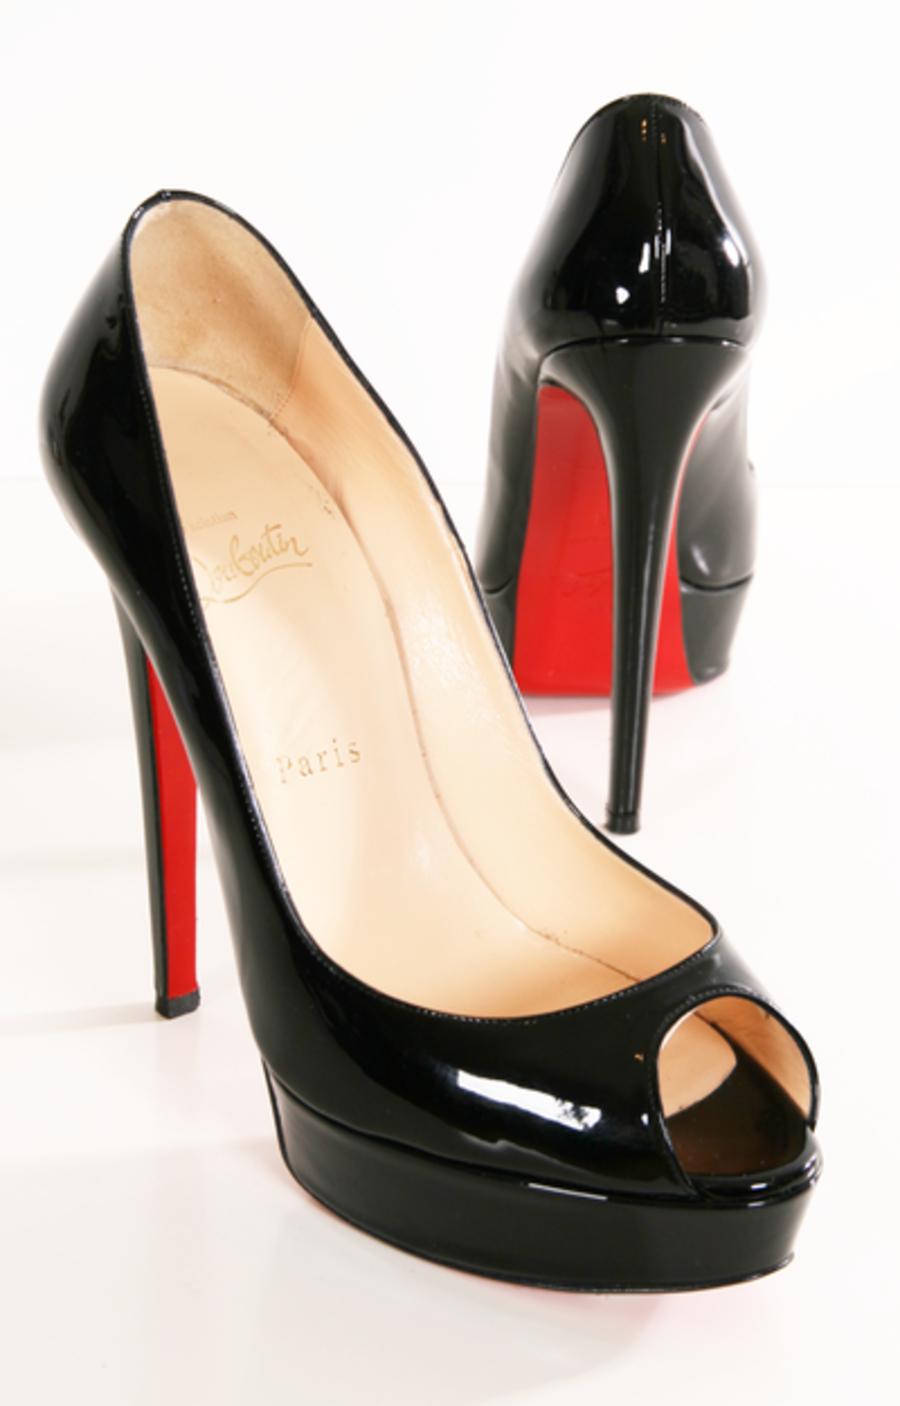 christian louboutin heels shop hers n e w a r r i v a. Black Bedroom Furniture Sets. Home Design Ideas